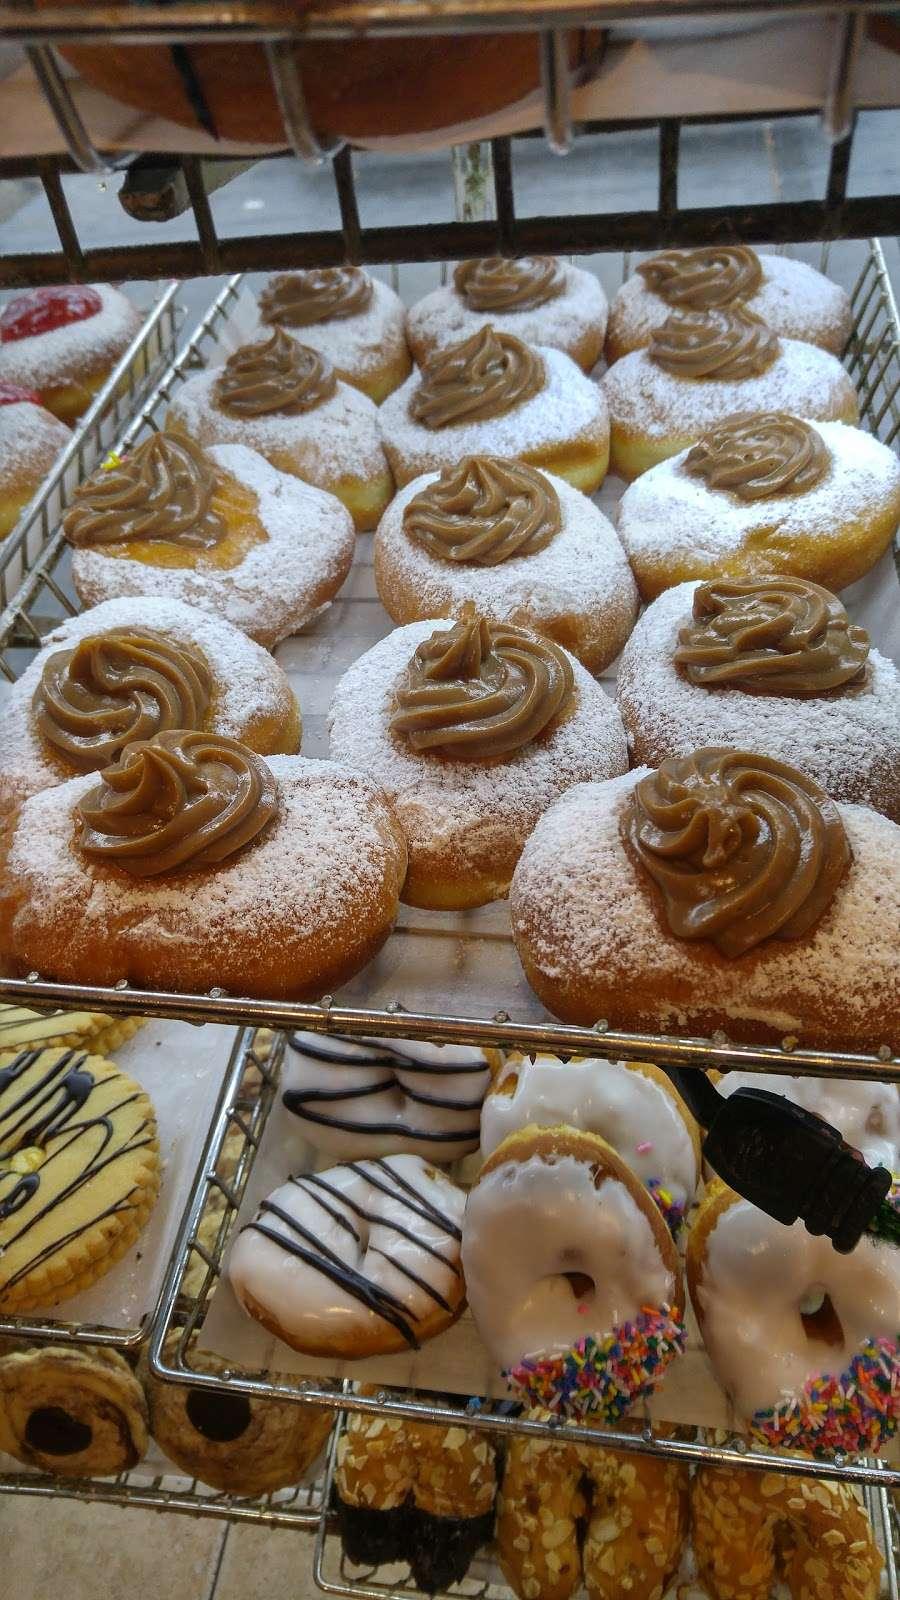 Gombos Heimishe Bakery - bakery    Photo 10 of 10   Address: 328 Kingston Ave, Brooklyn, NY 11213, USA   Phone: (718) 771-7701